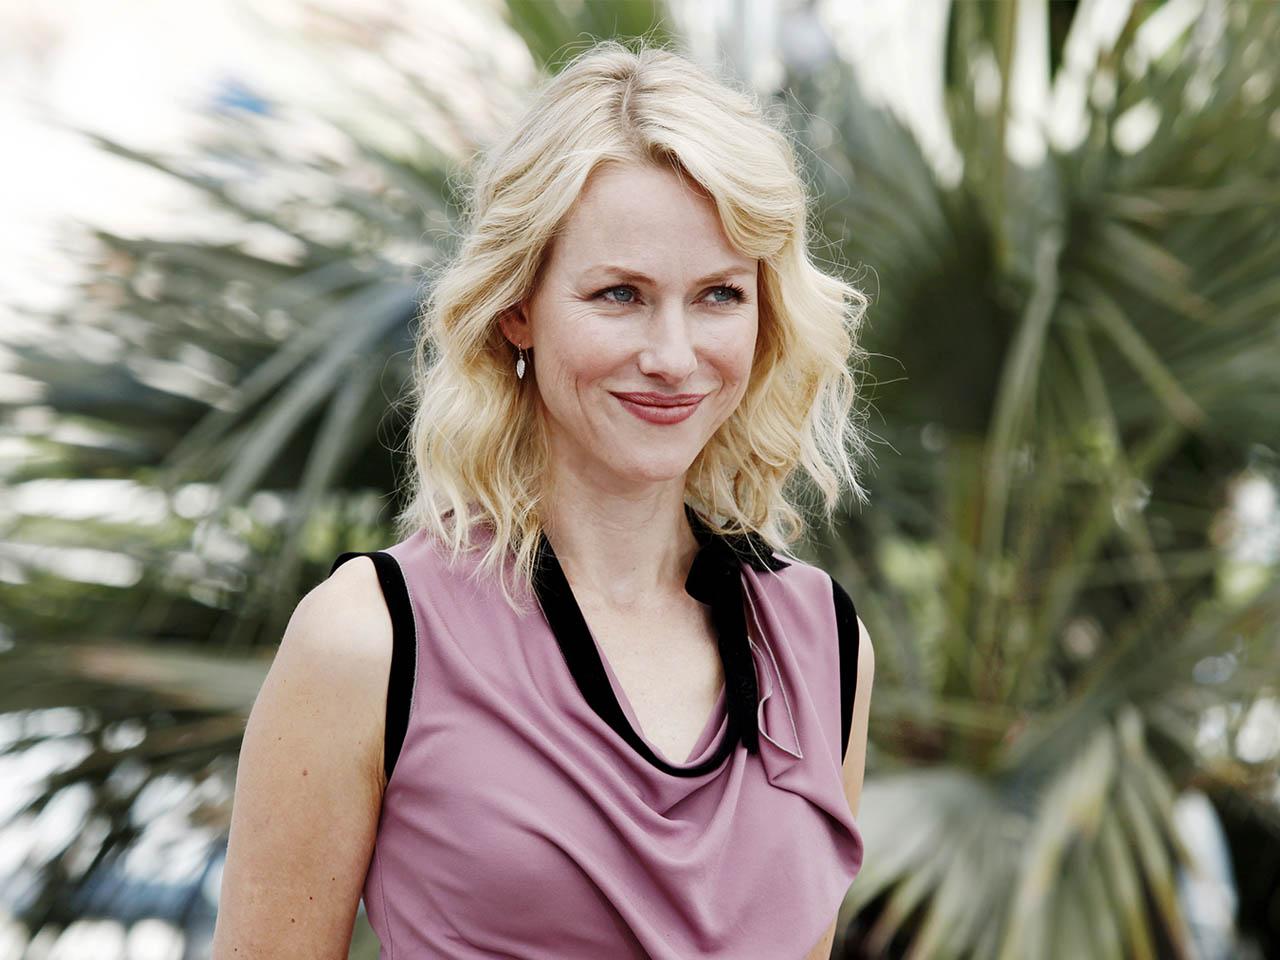 Shutterstock - Naomi Watts - Andrea Raffin